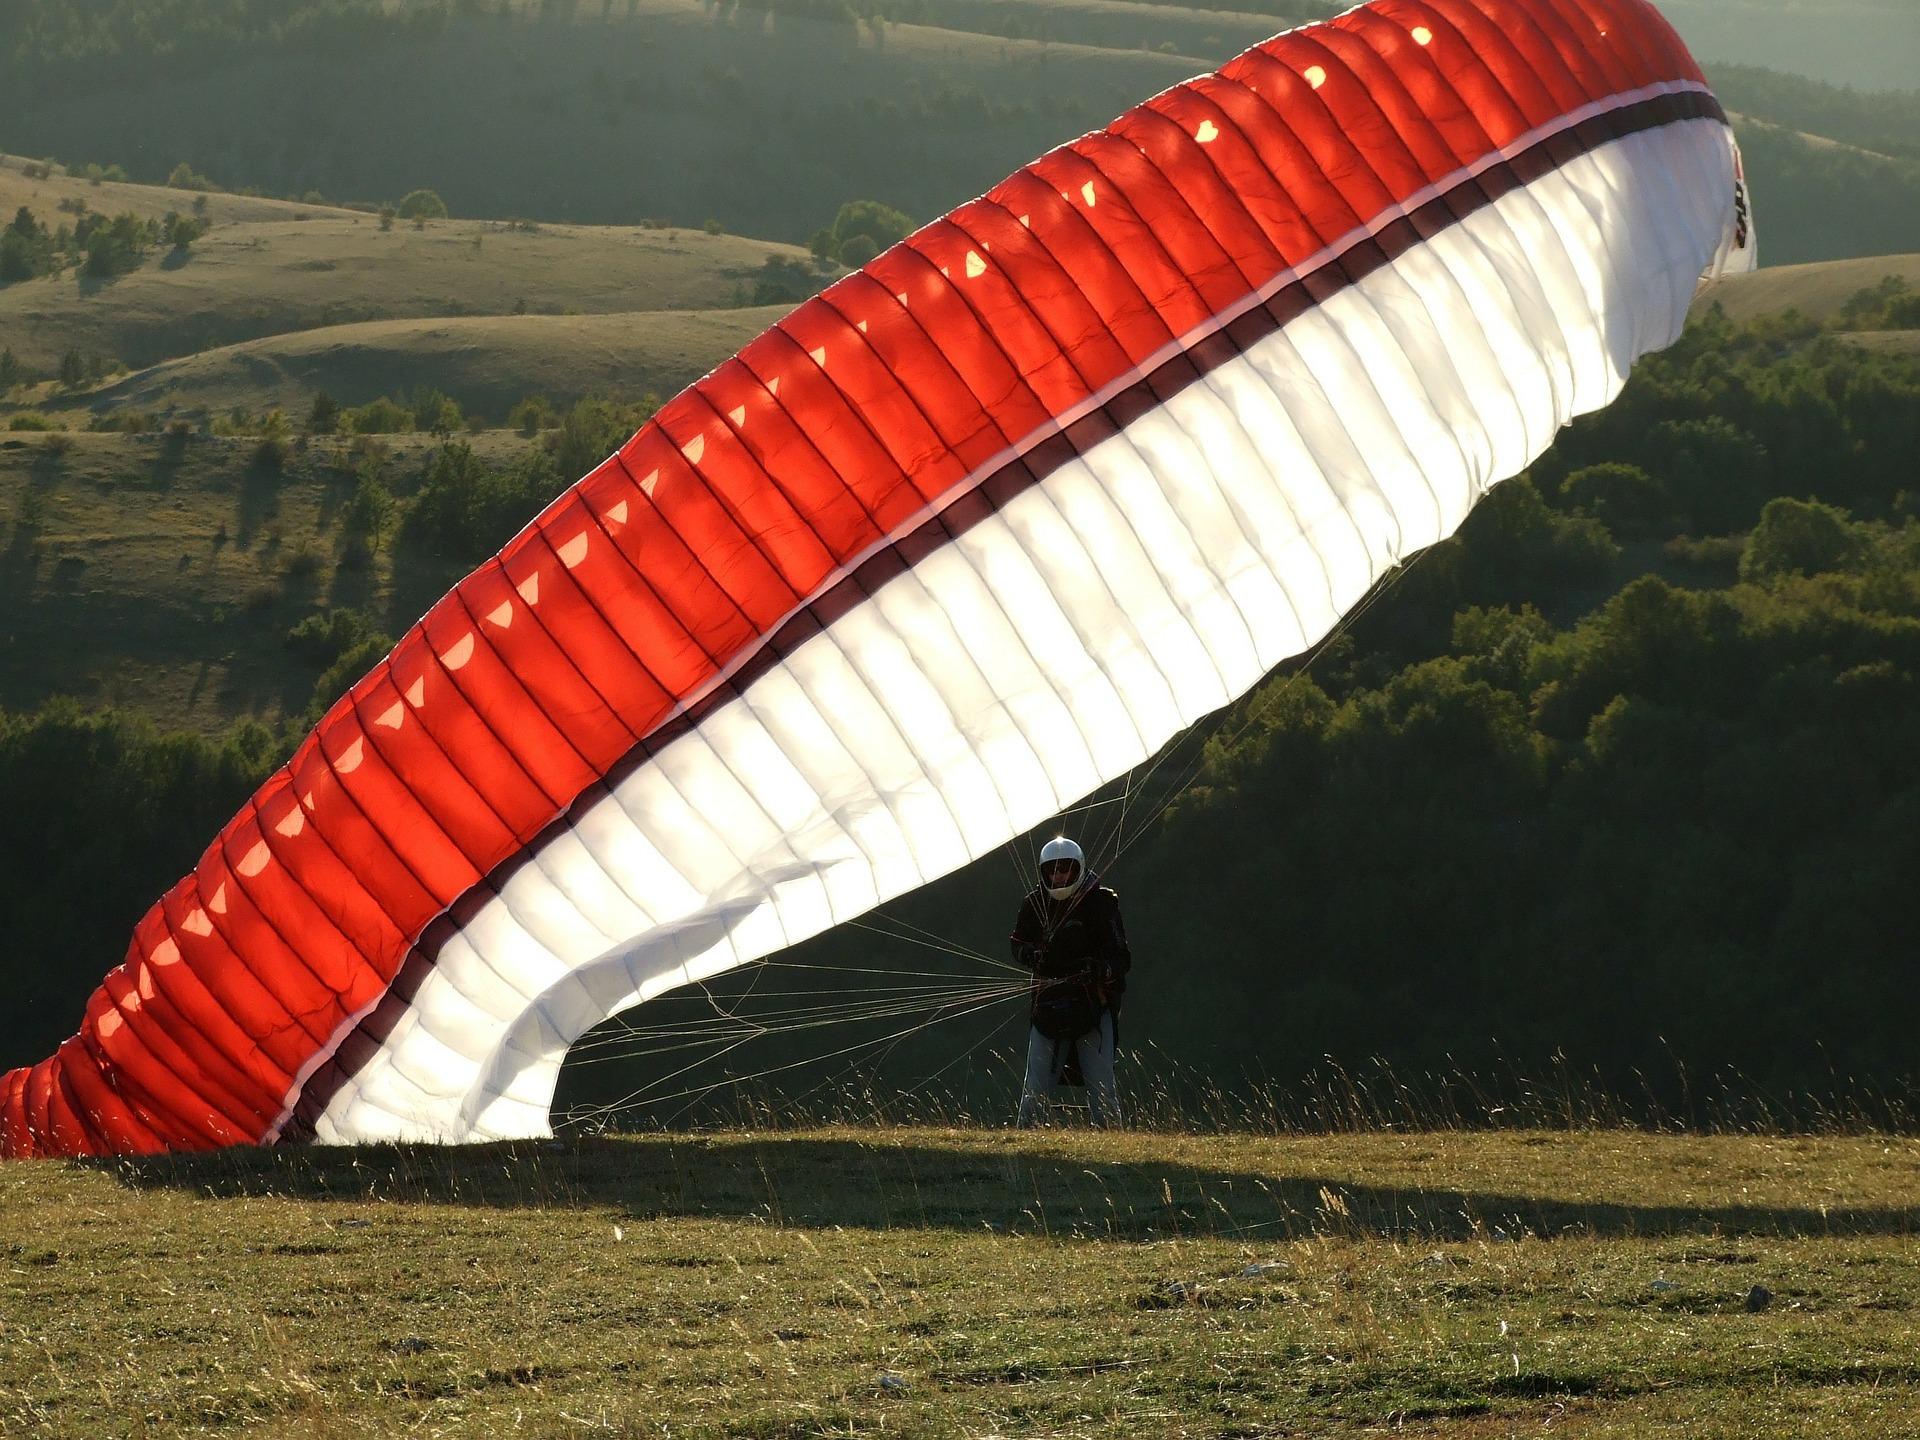 parachute 114368 1920